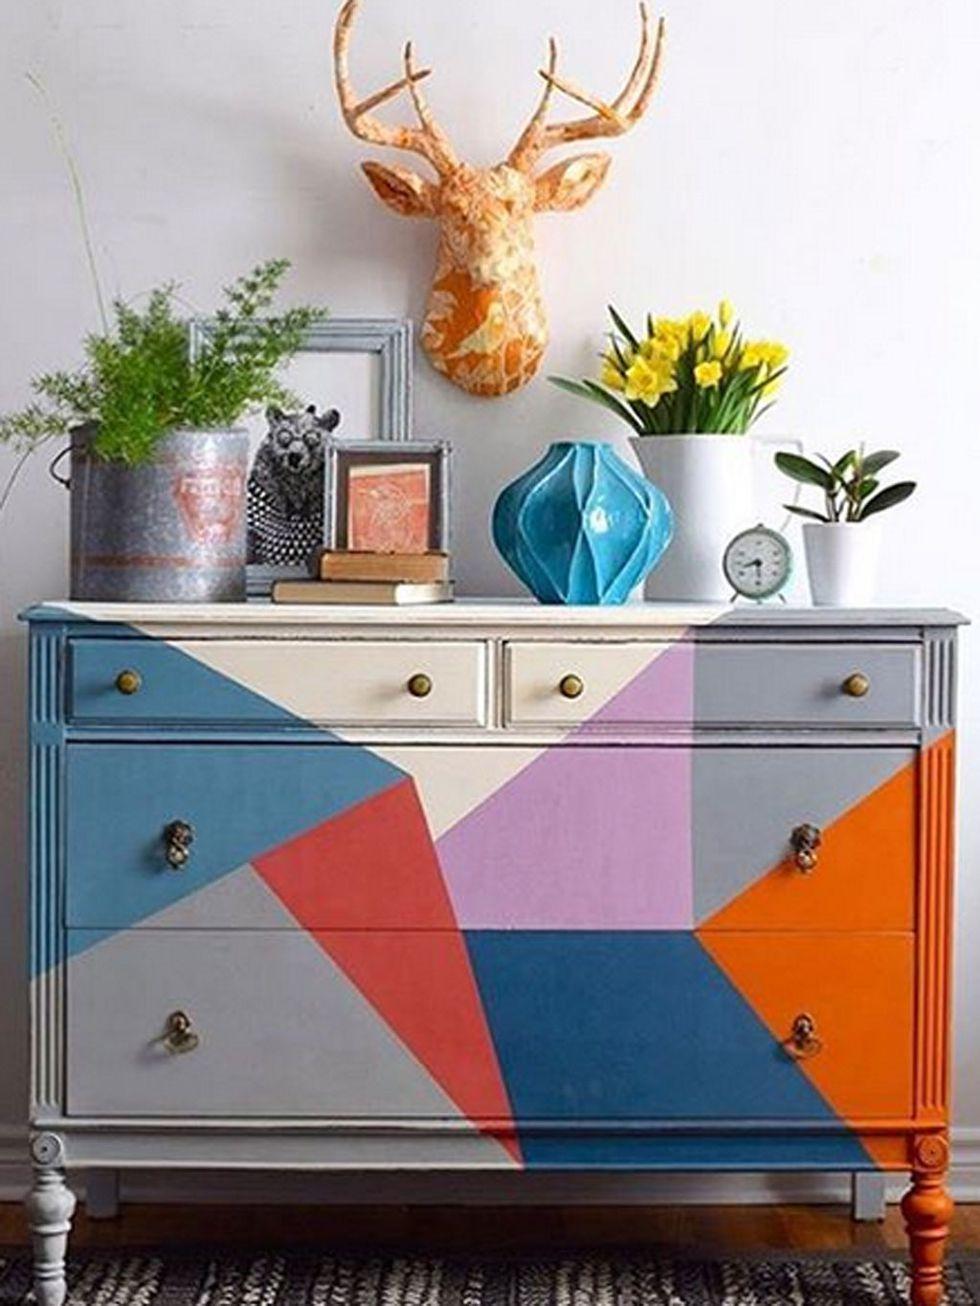 41++ Ideas para pintar muebles trends